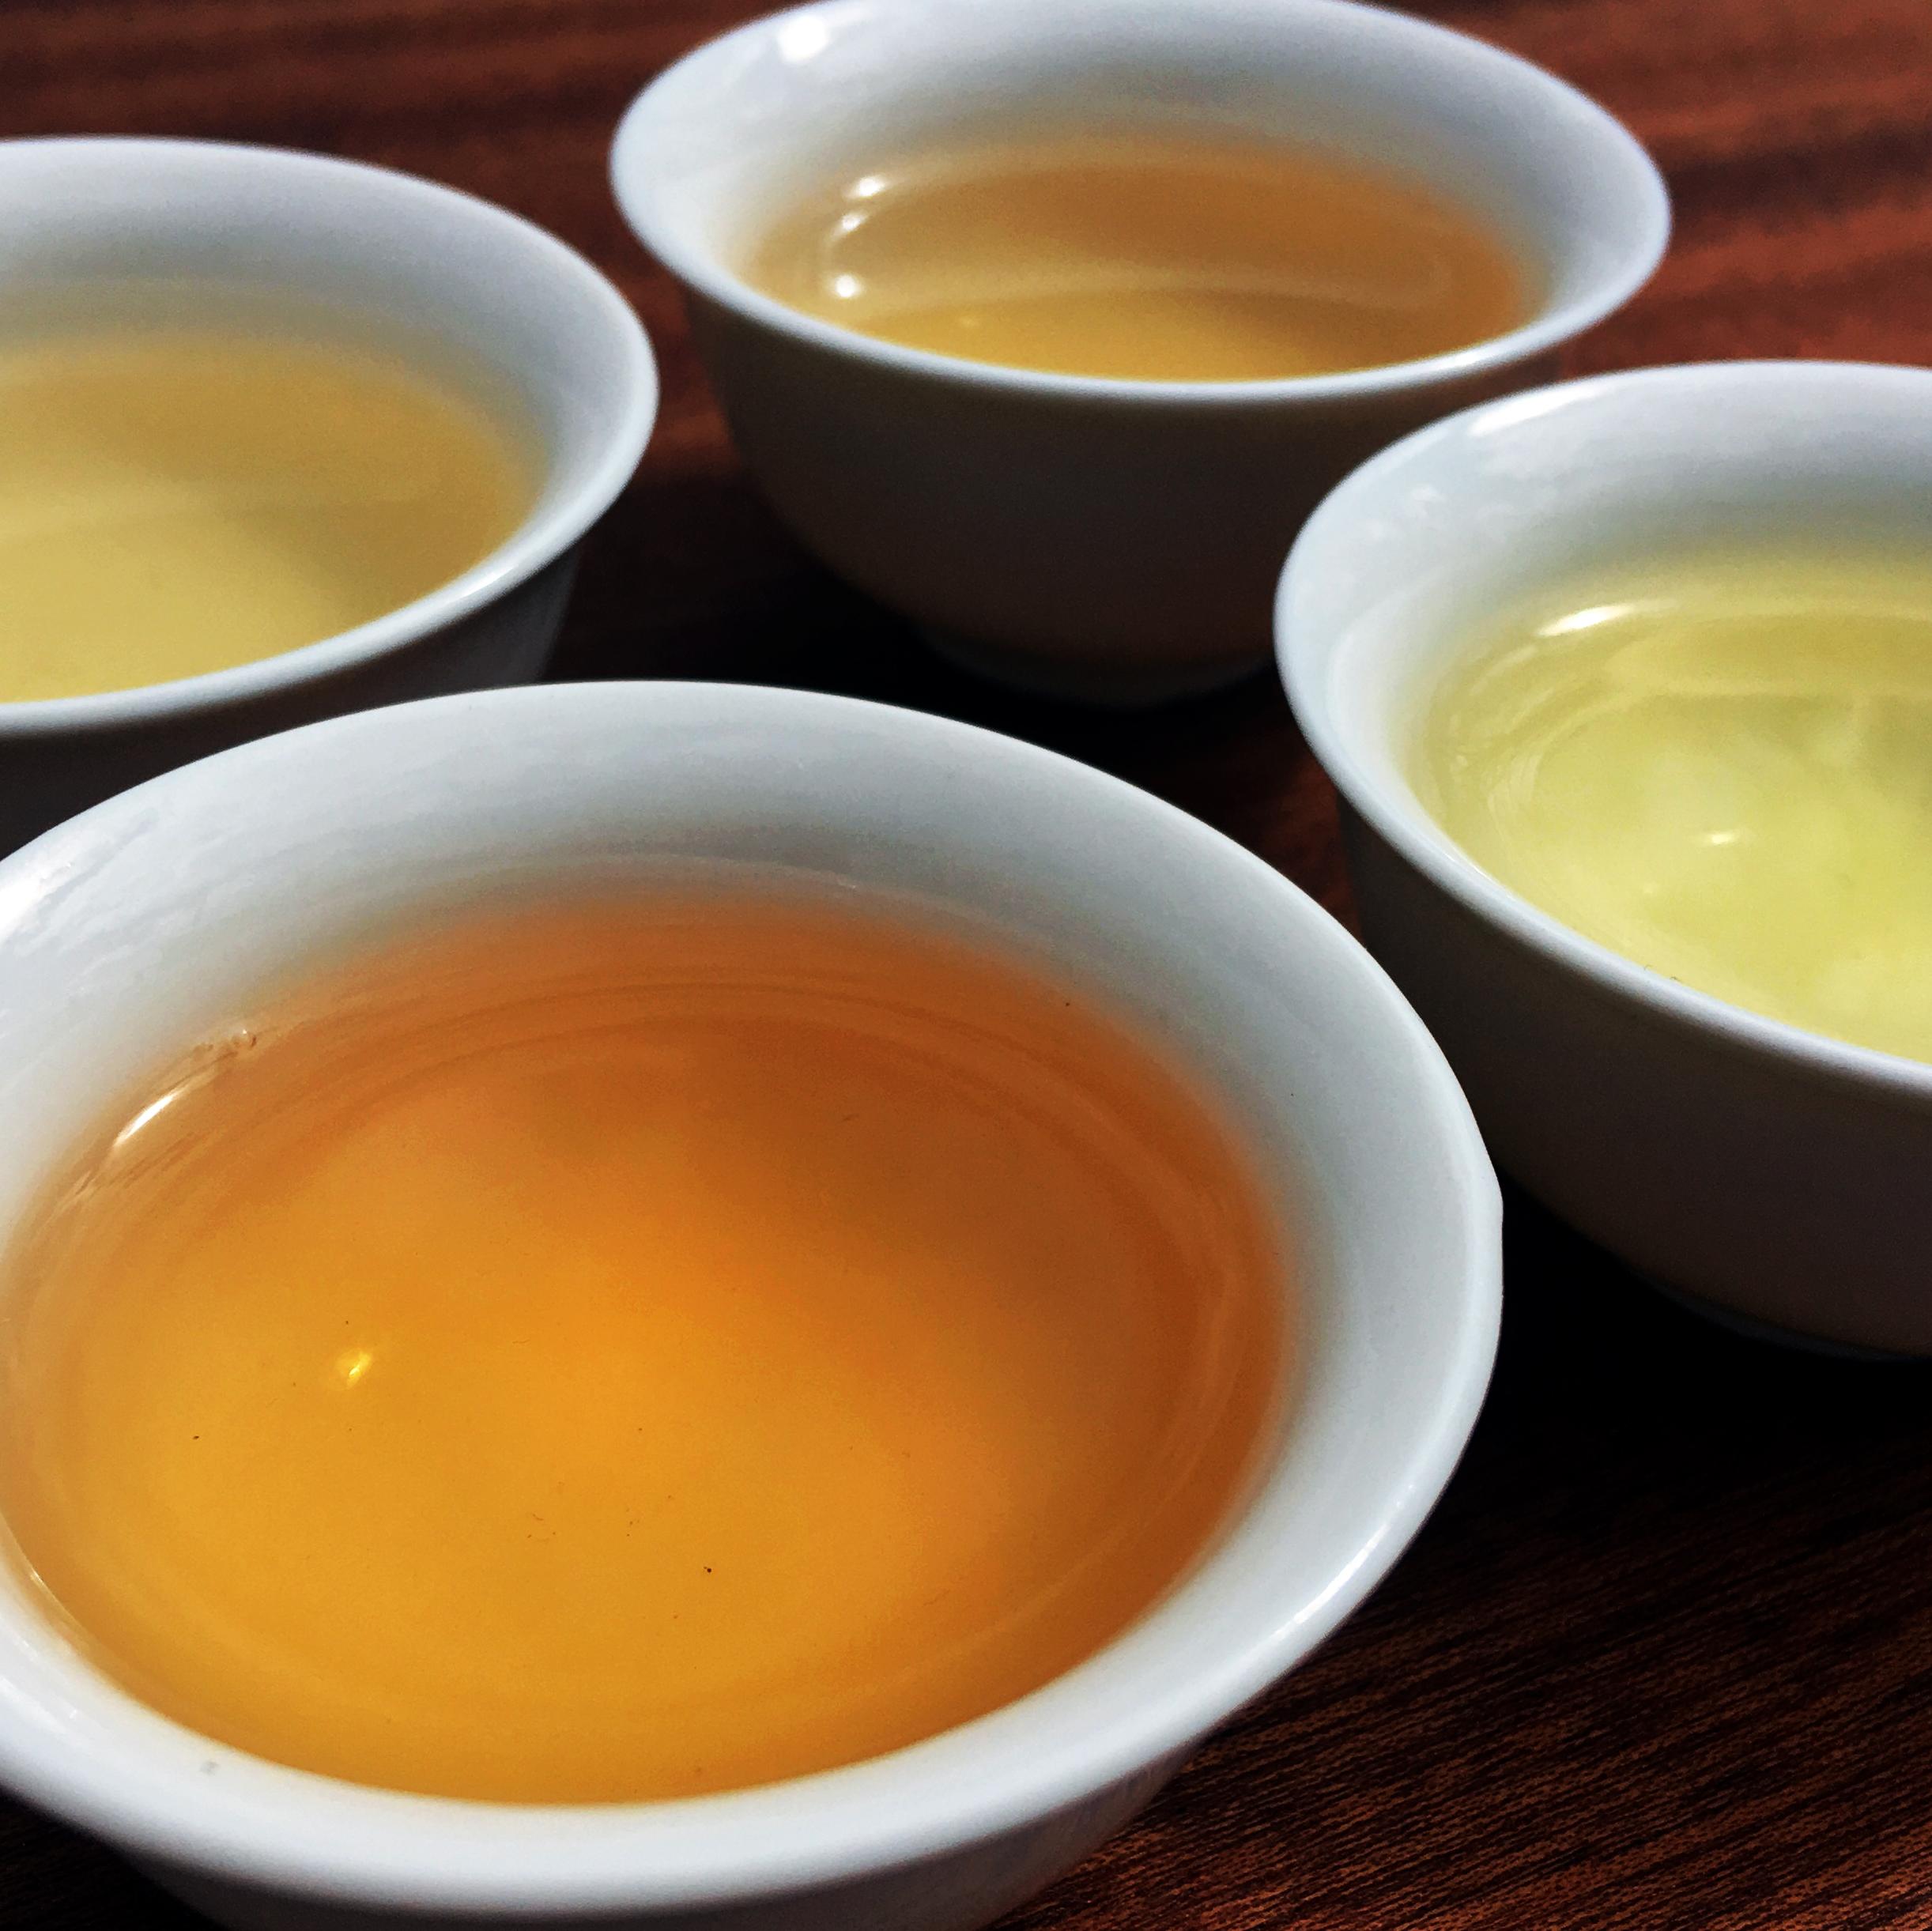 FujianToAliShan-mem-oolong-loose-whole-leaf-tea.jpg